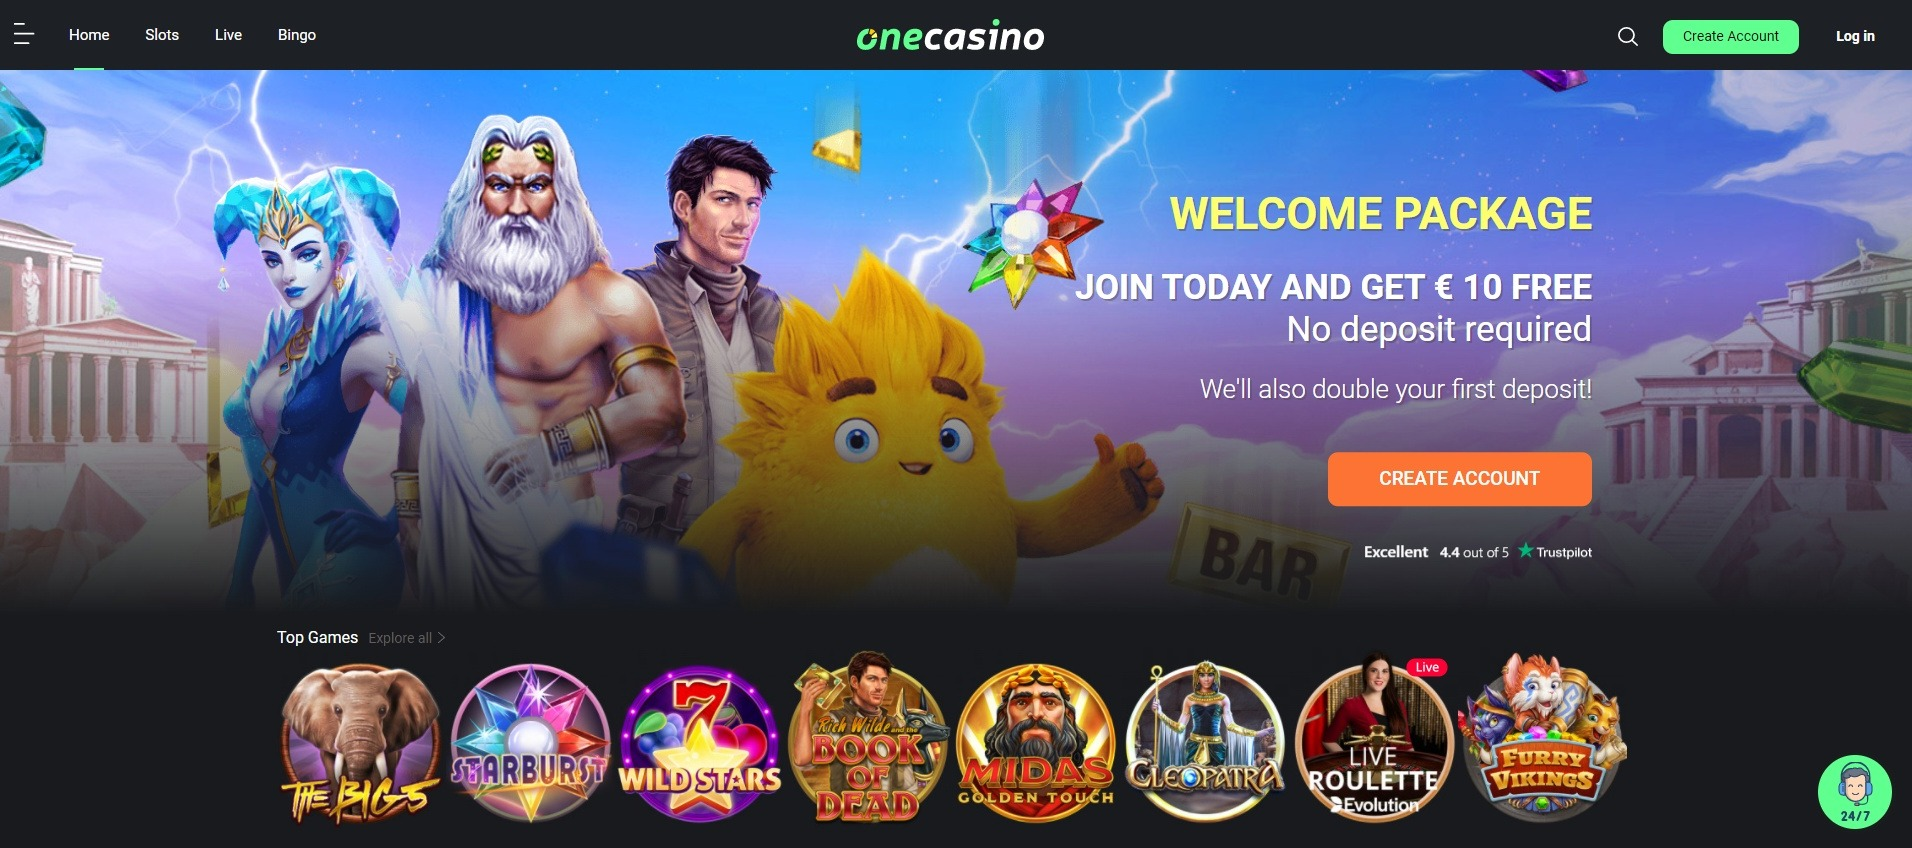 onecasino review